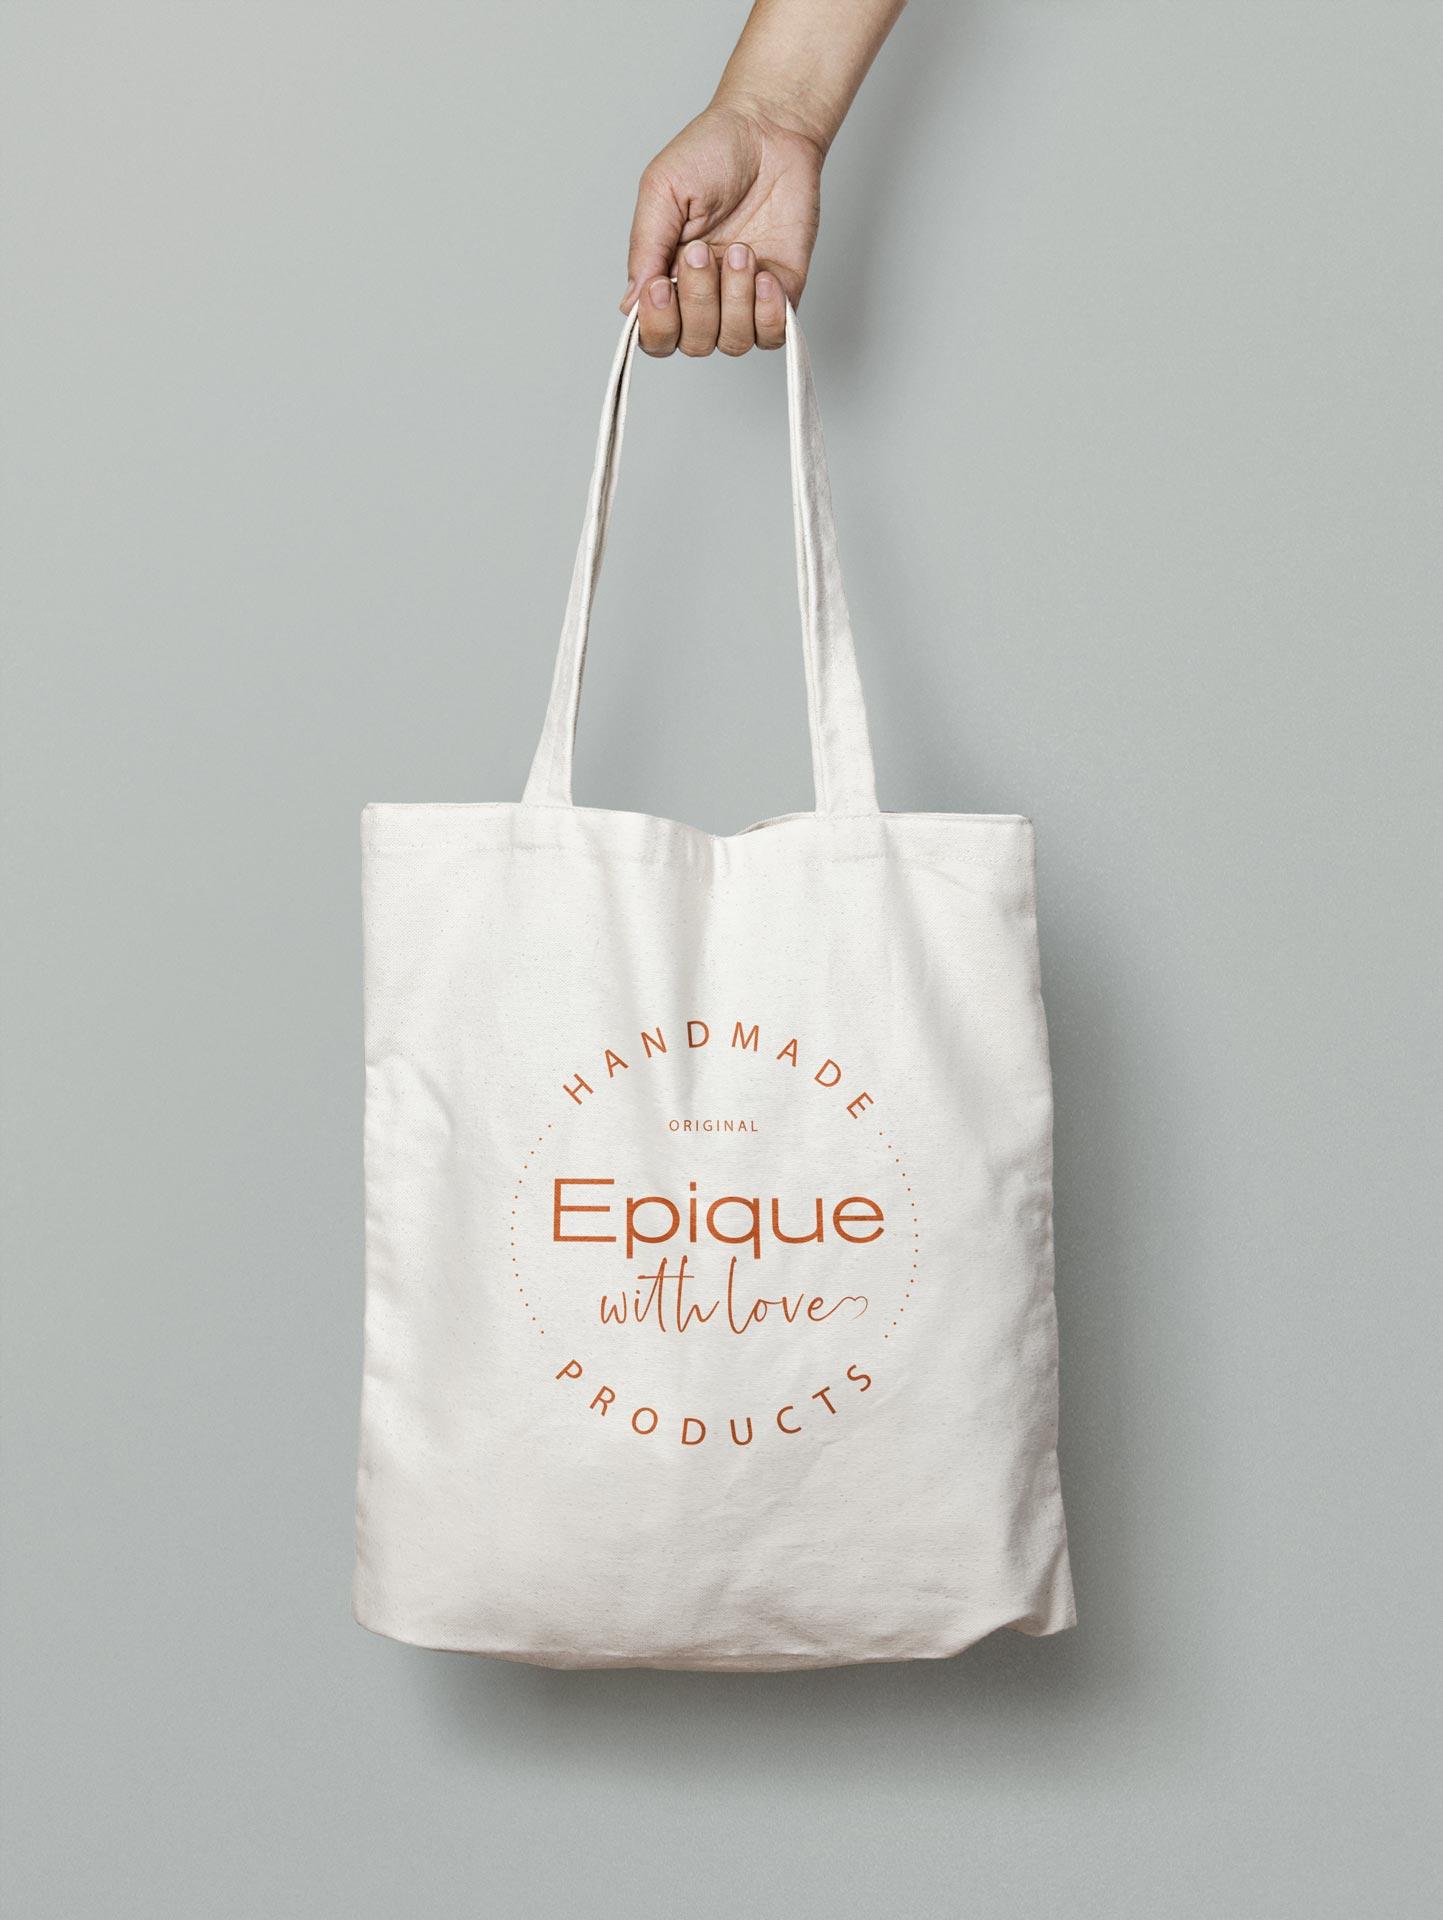 epique-with-love-store-canvas-bag